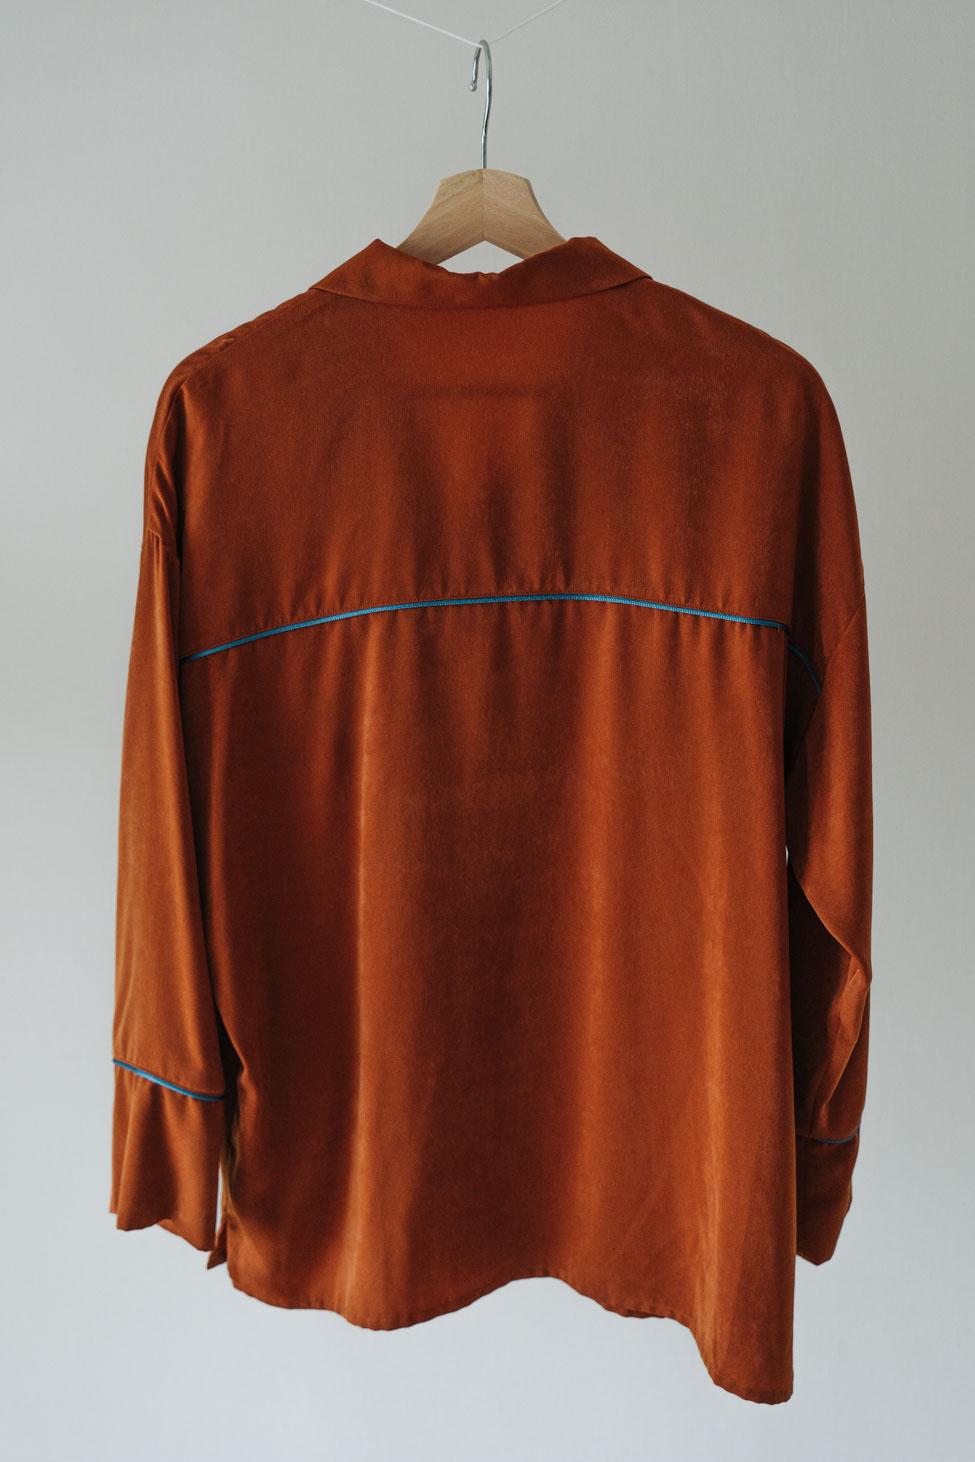 Vintage Satin Pajamas Tops オレンジ